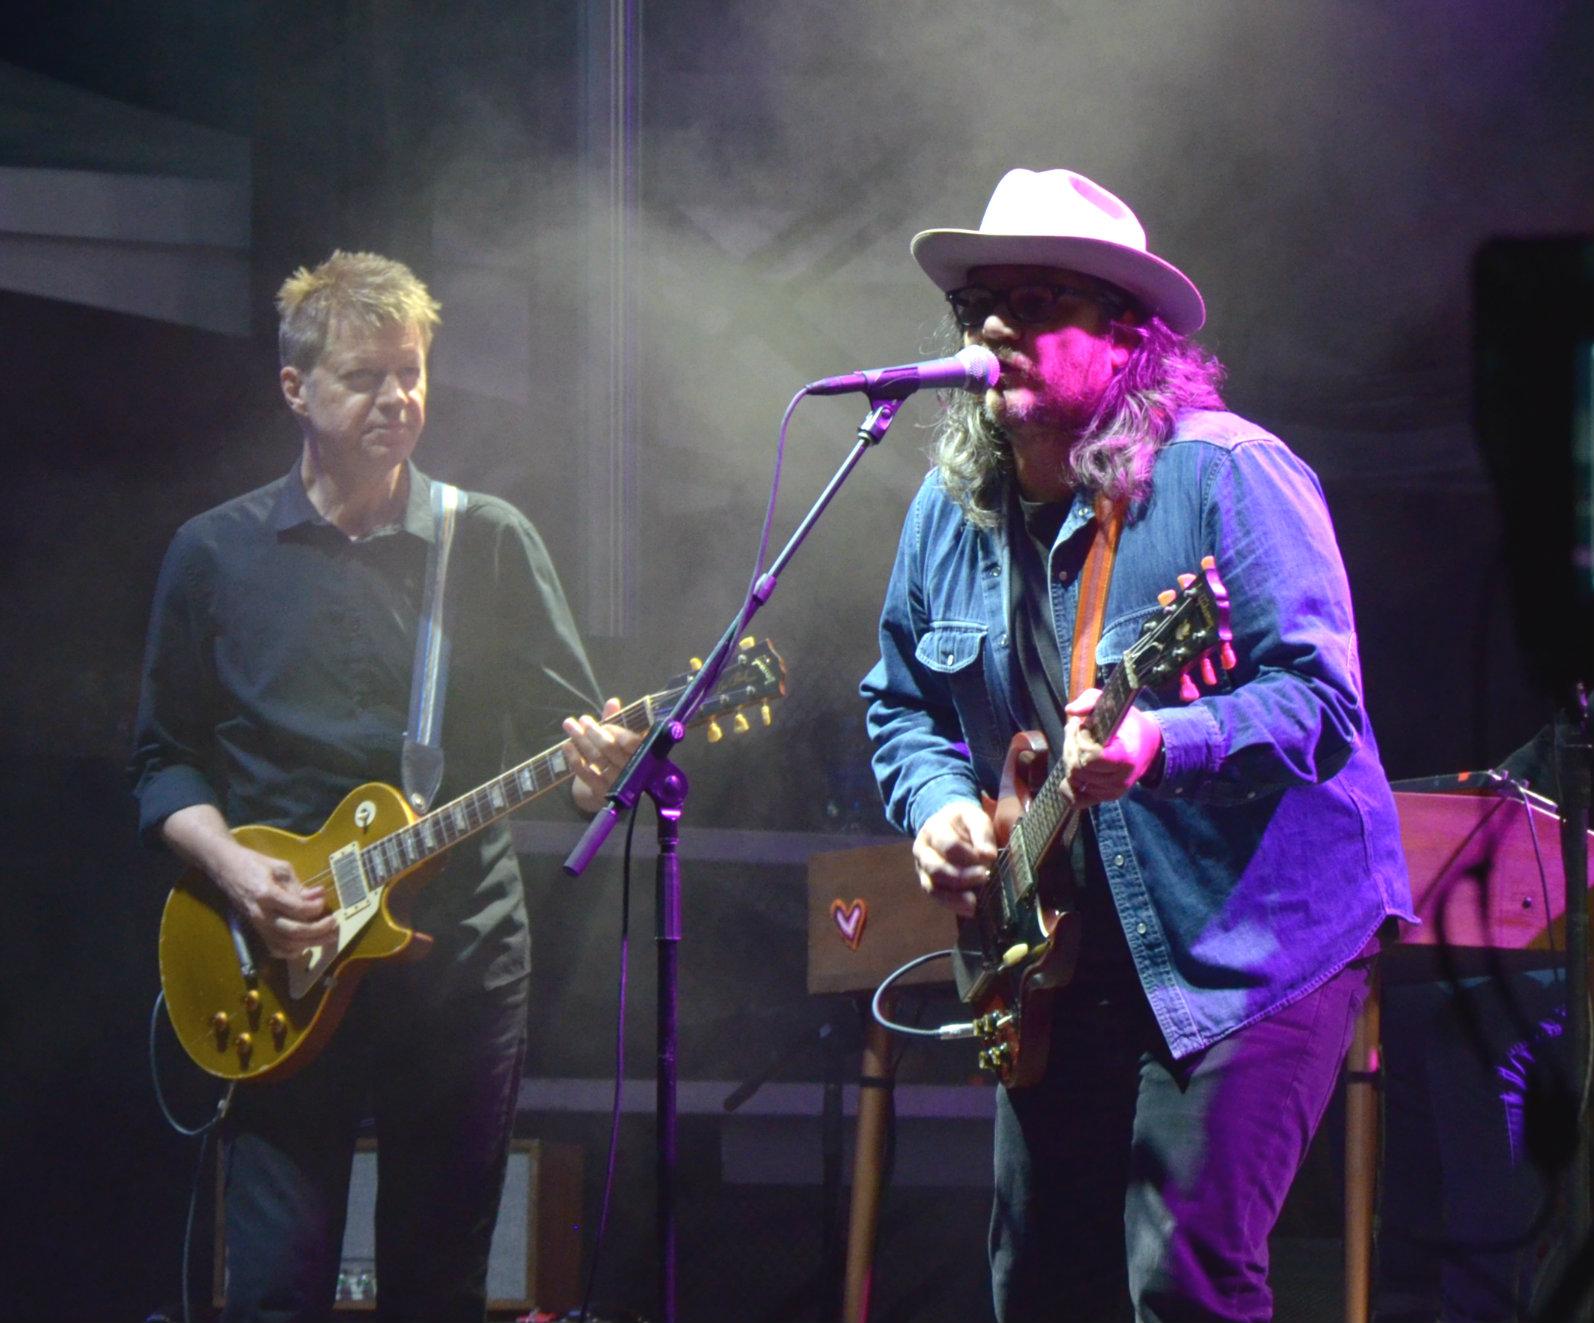 Photo: Wilco at Velorama 2017